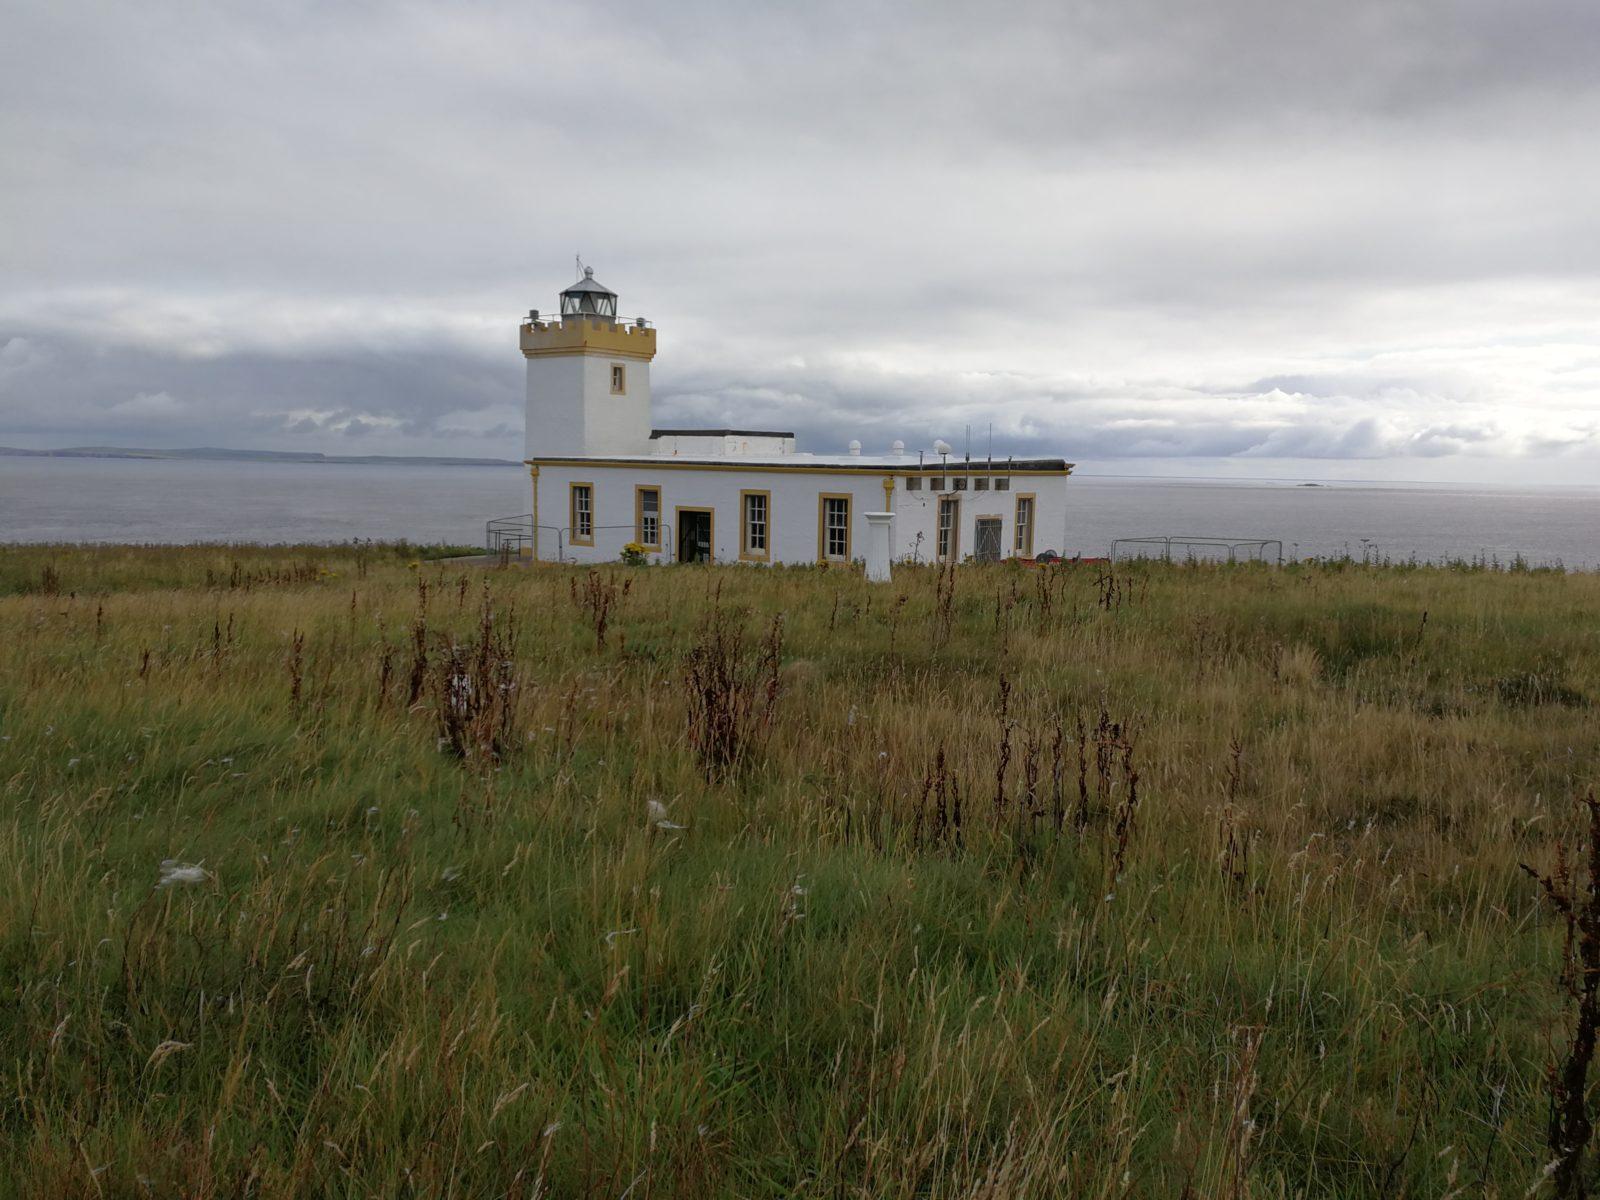 Phare surplombant le Pentland Firth en Ecosse